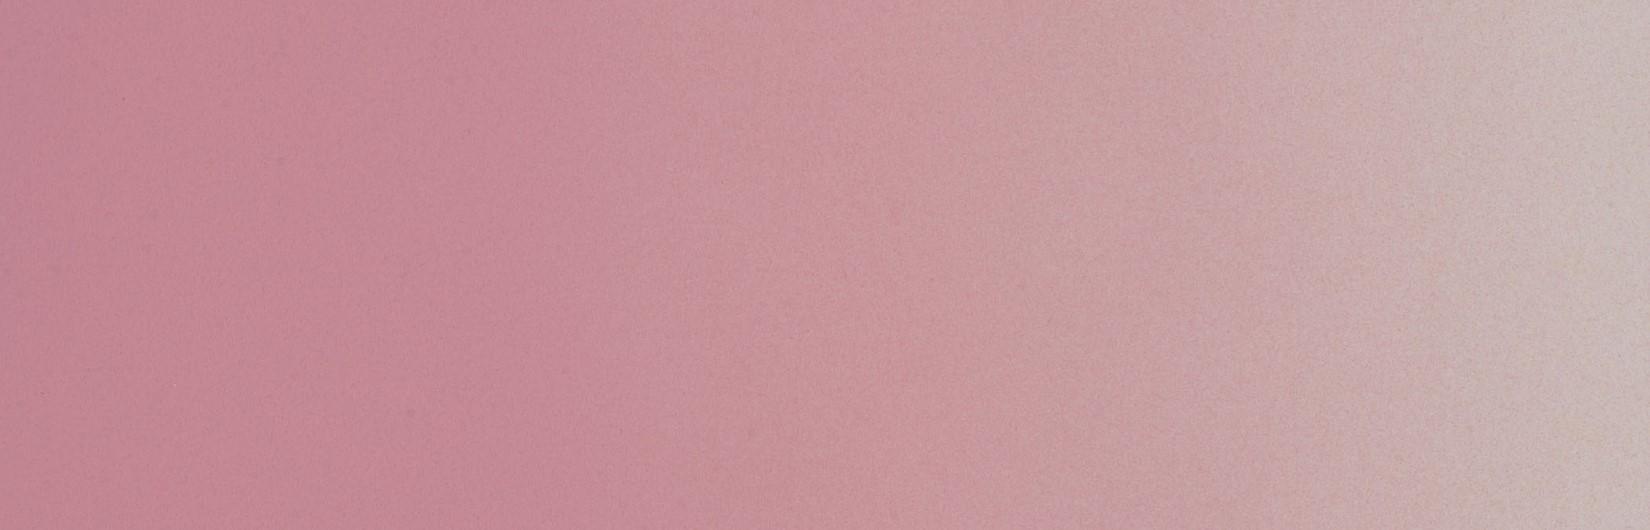 5038-createx-illustration-bloodline-infectious-pink.jpg